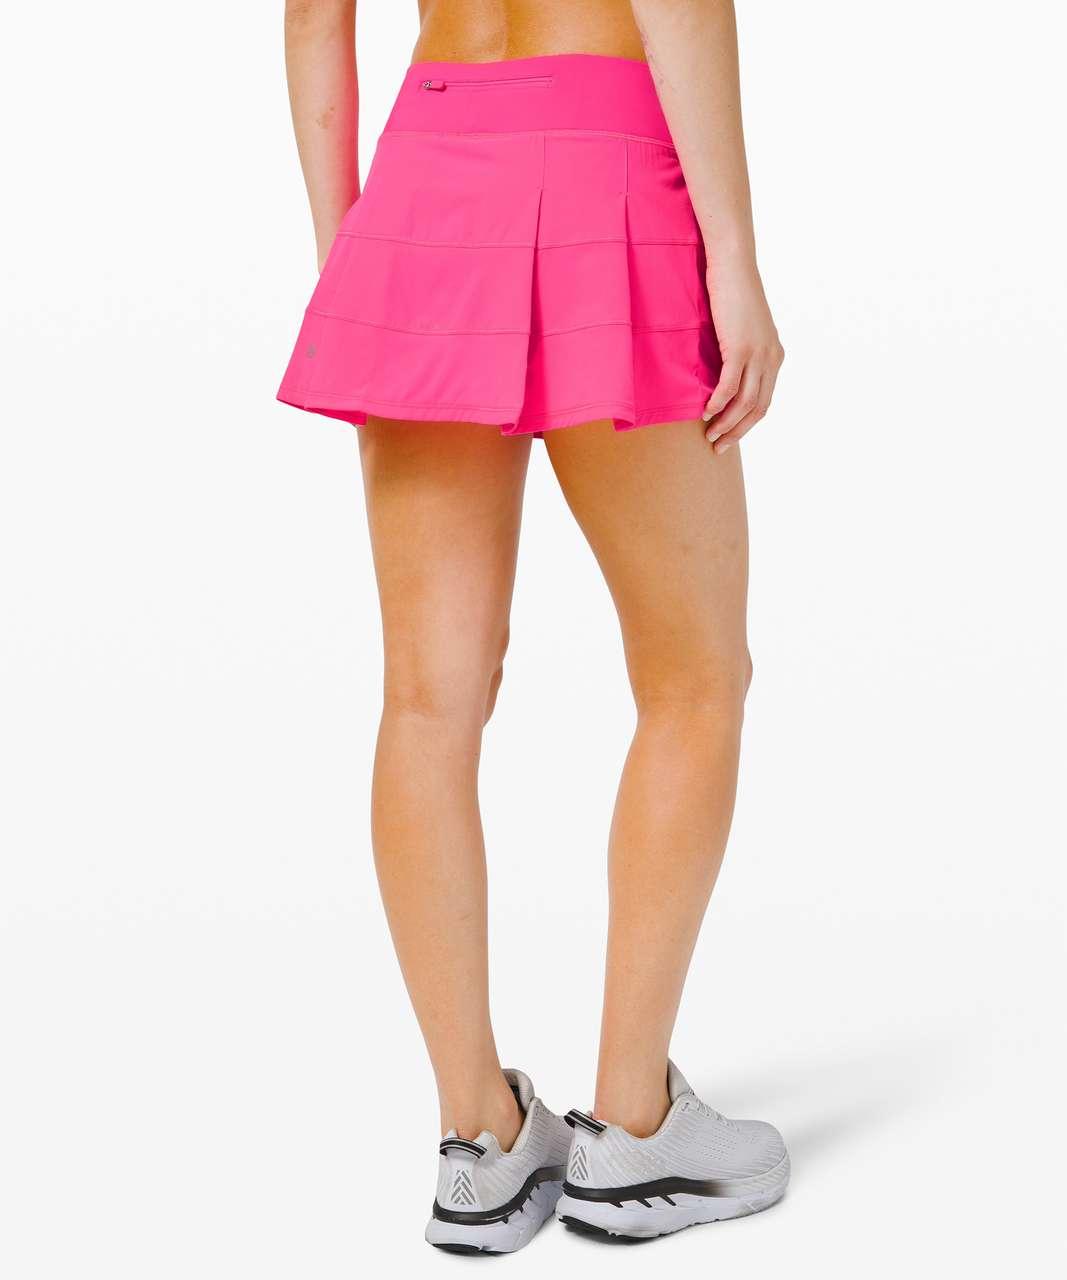 "Lululemon Pace Rival Skirt (Regular) *4-way Stretch 13"" - Pink Highlight"